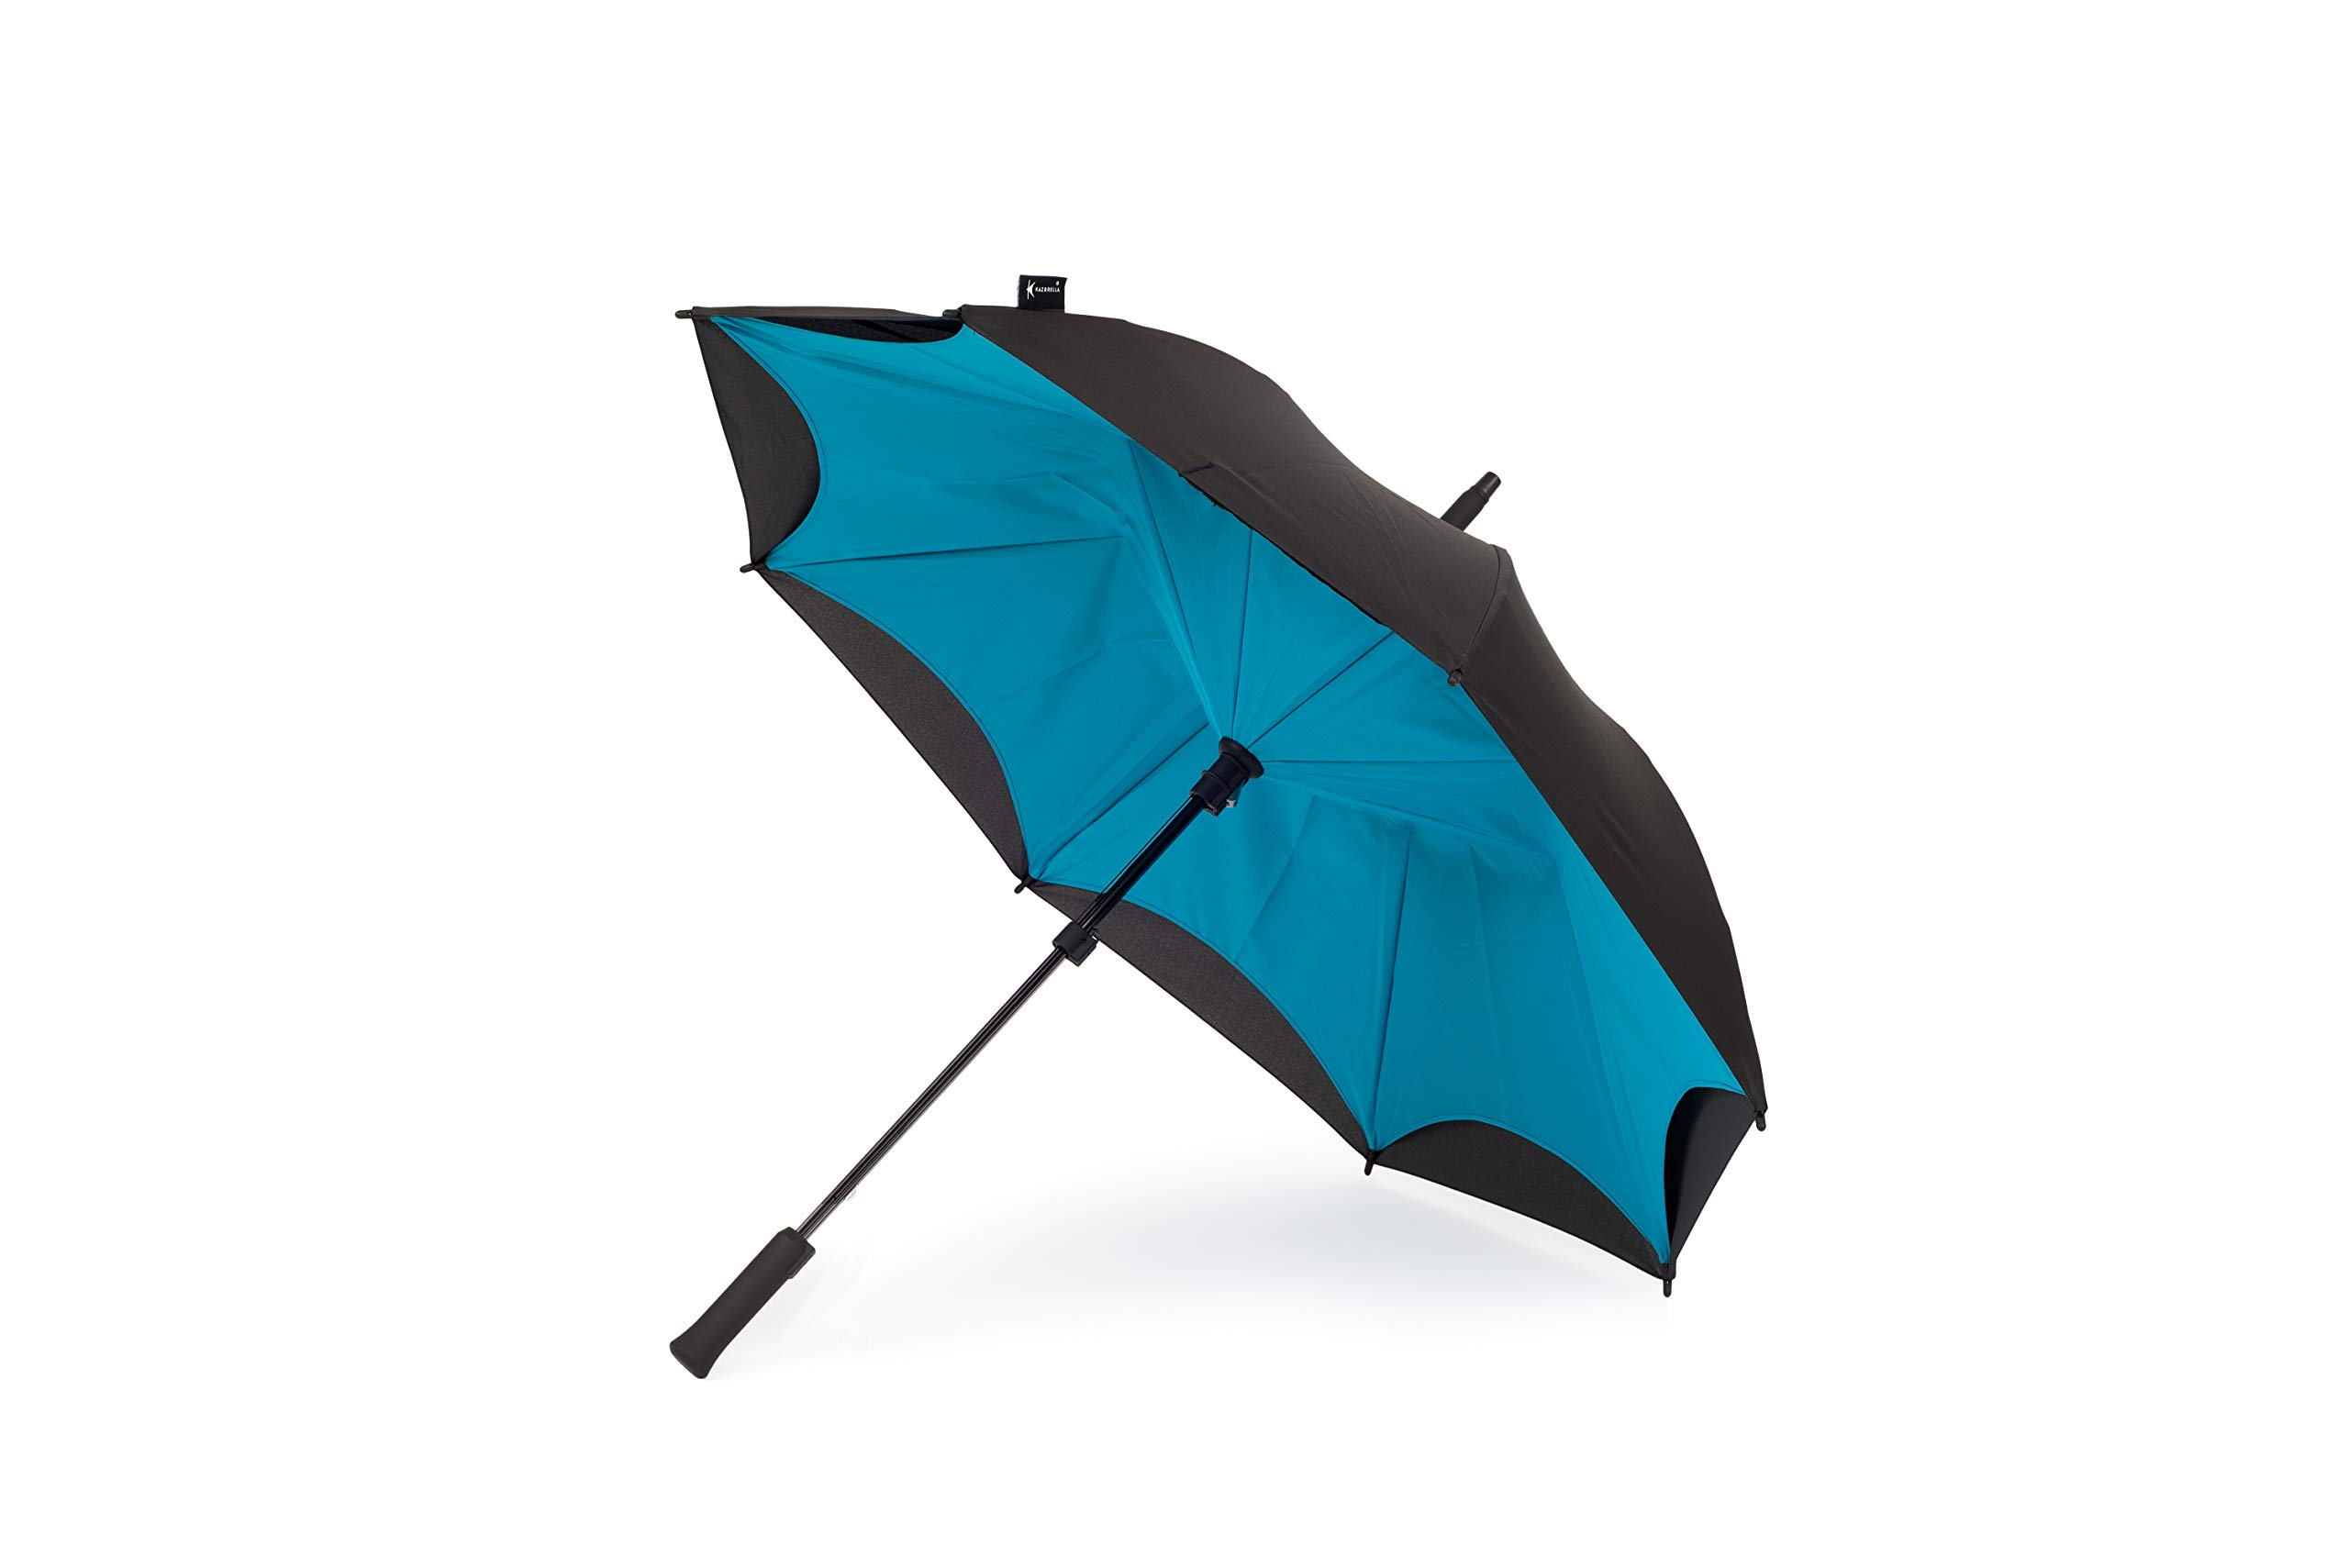 Orginal Kazbrella Reverse Folding Inverted Umbrella Double Layer Wind Proof UV Proof (Turquoise + Black (straight handle))